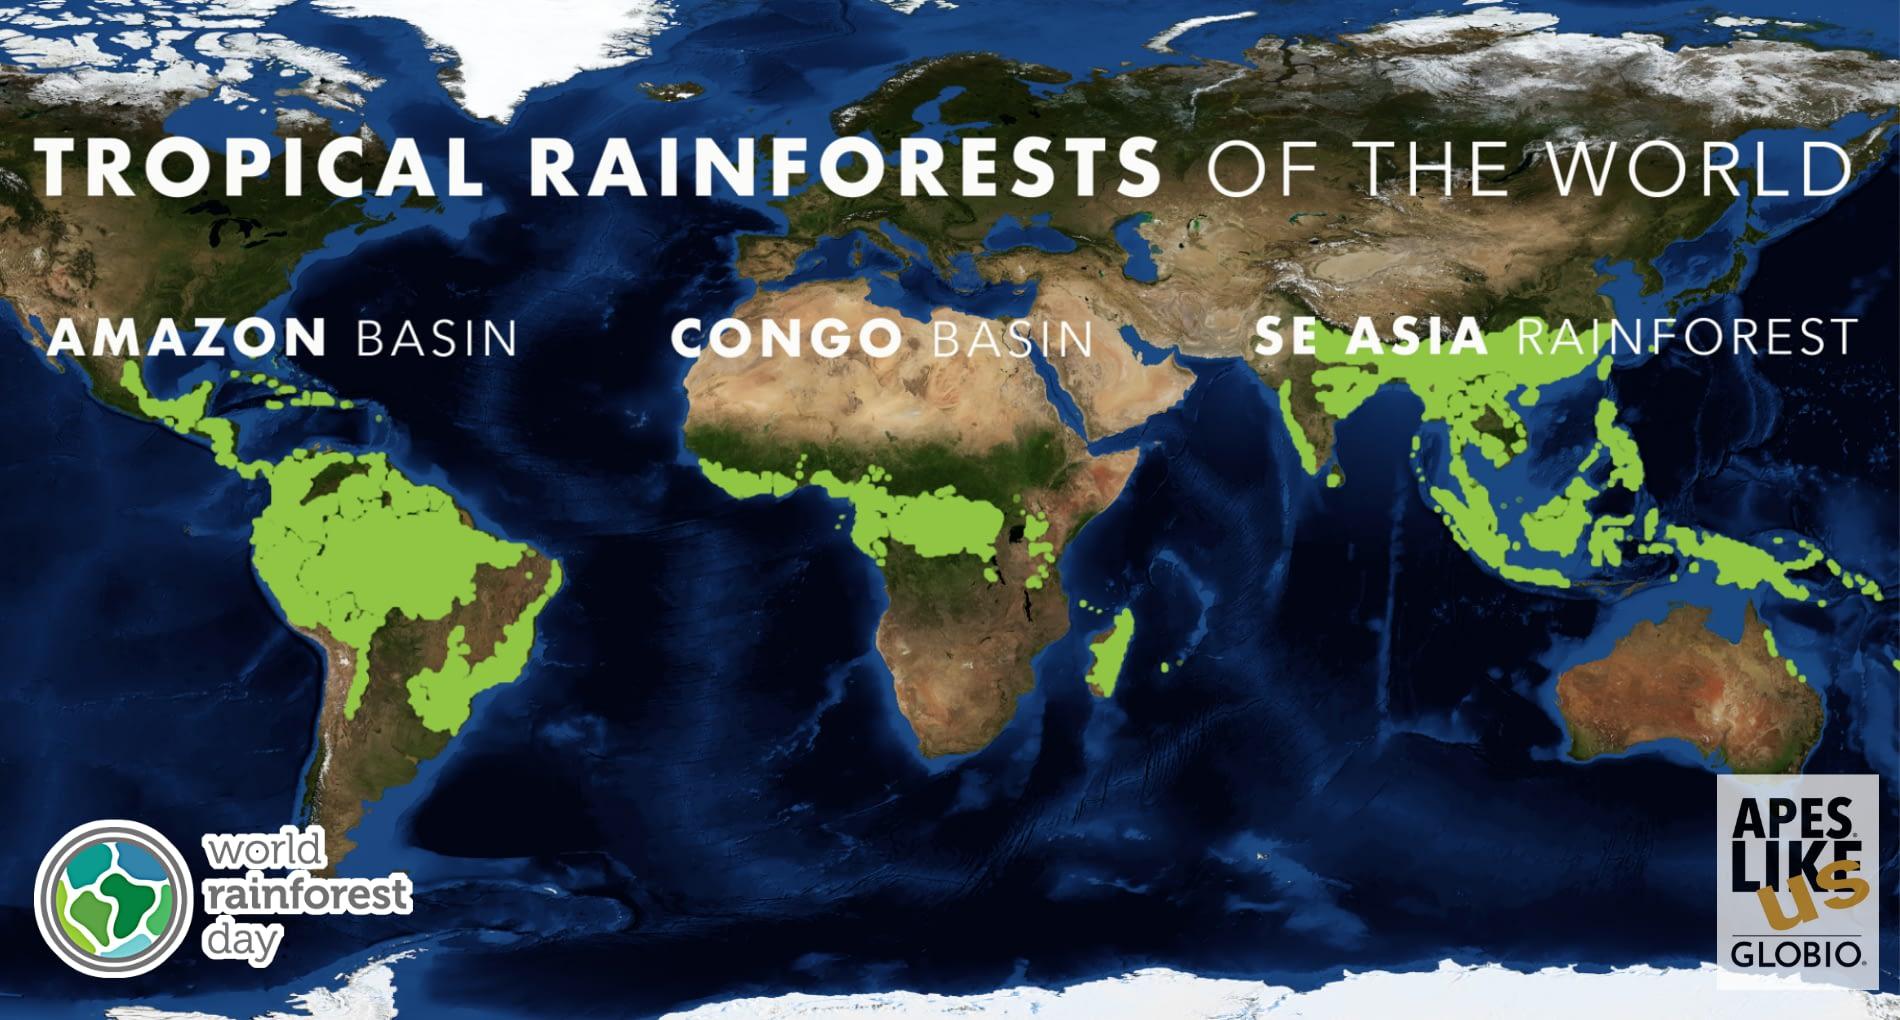 Map of Tropical Rainforest Range around the World